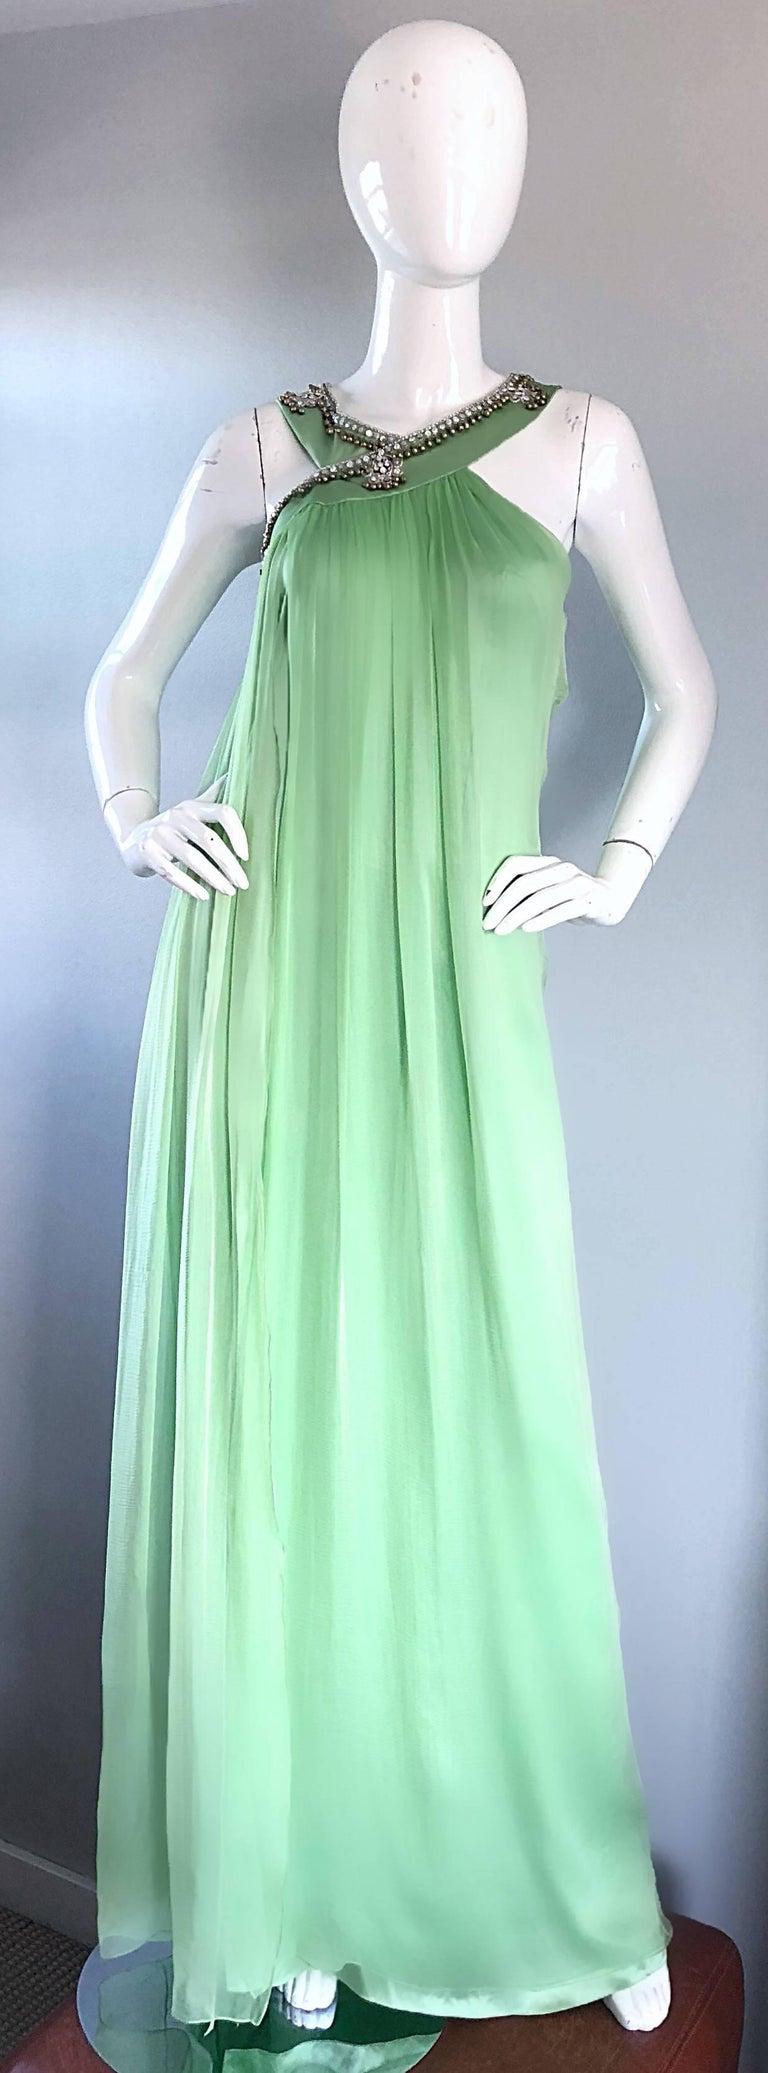 New Christian Dior John Galliano Light Green Silk Chiffon Grecian Gown, Sz 10   In New Condition For Sale In Chicago, IL